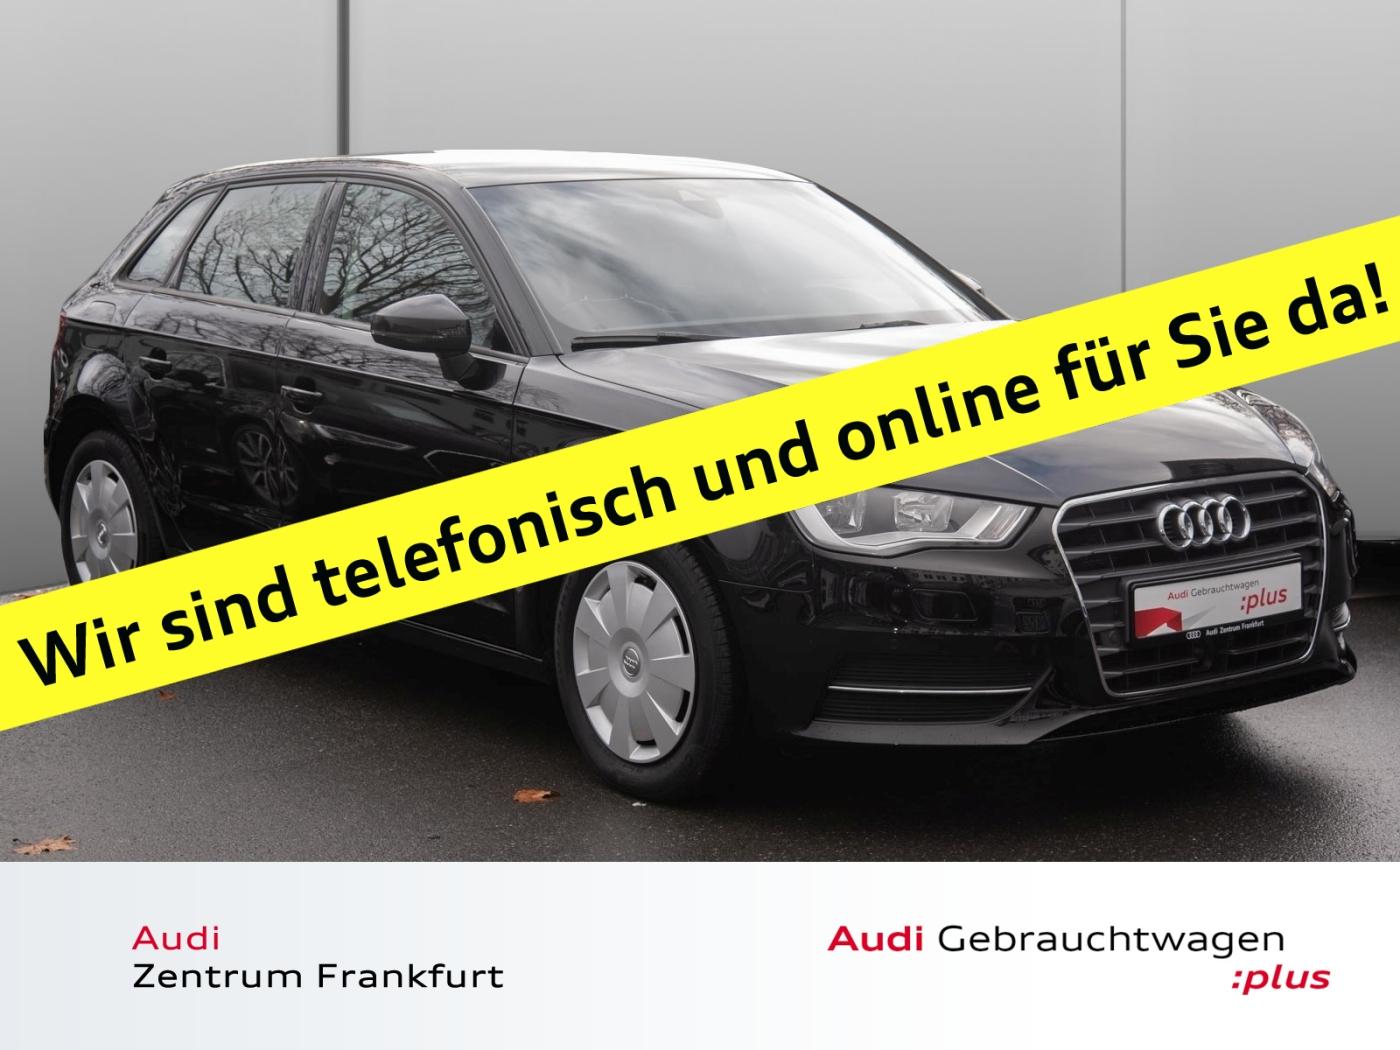 Audi A3 Sportback 2.0 TDI Attraction Navi PDC Sitzhei, Jahr 2016, Diesel